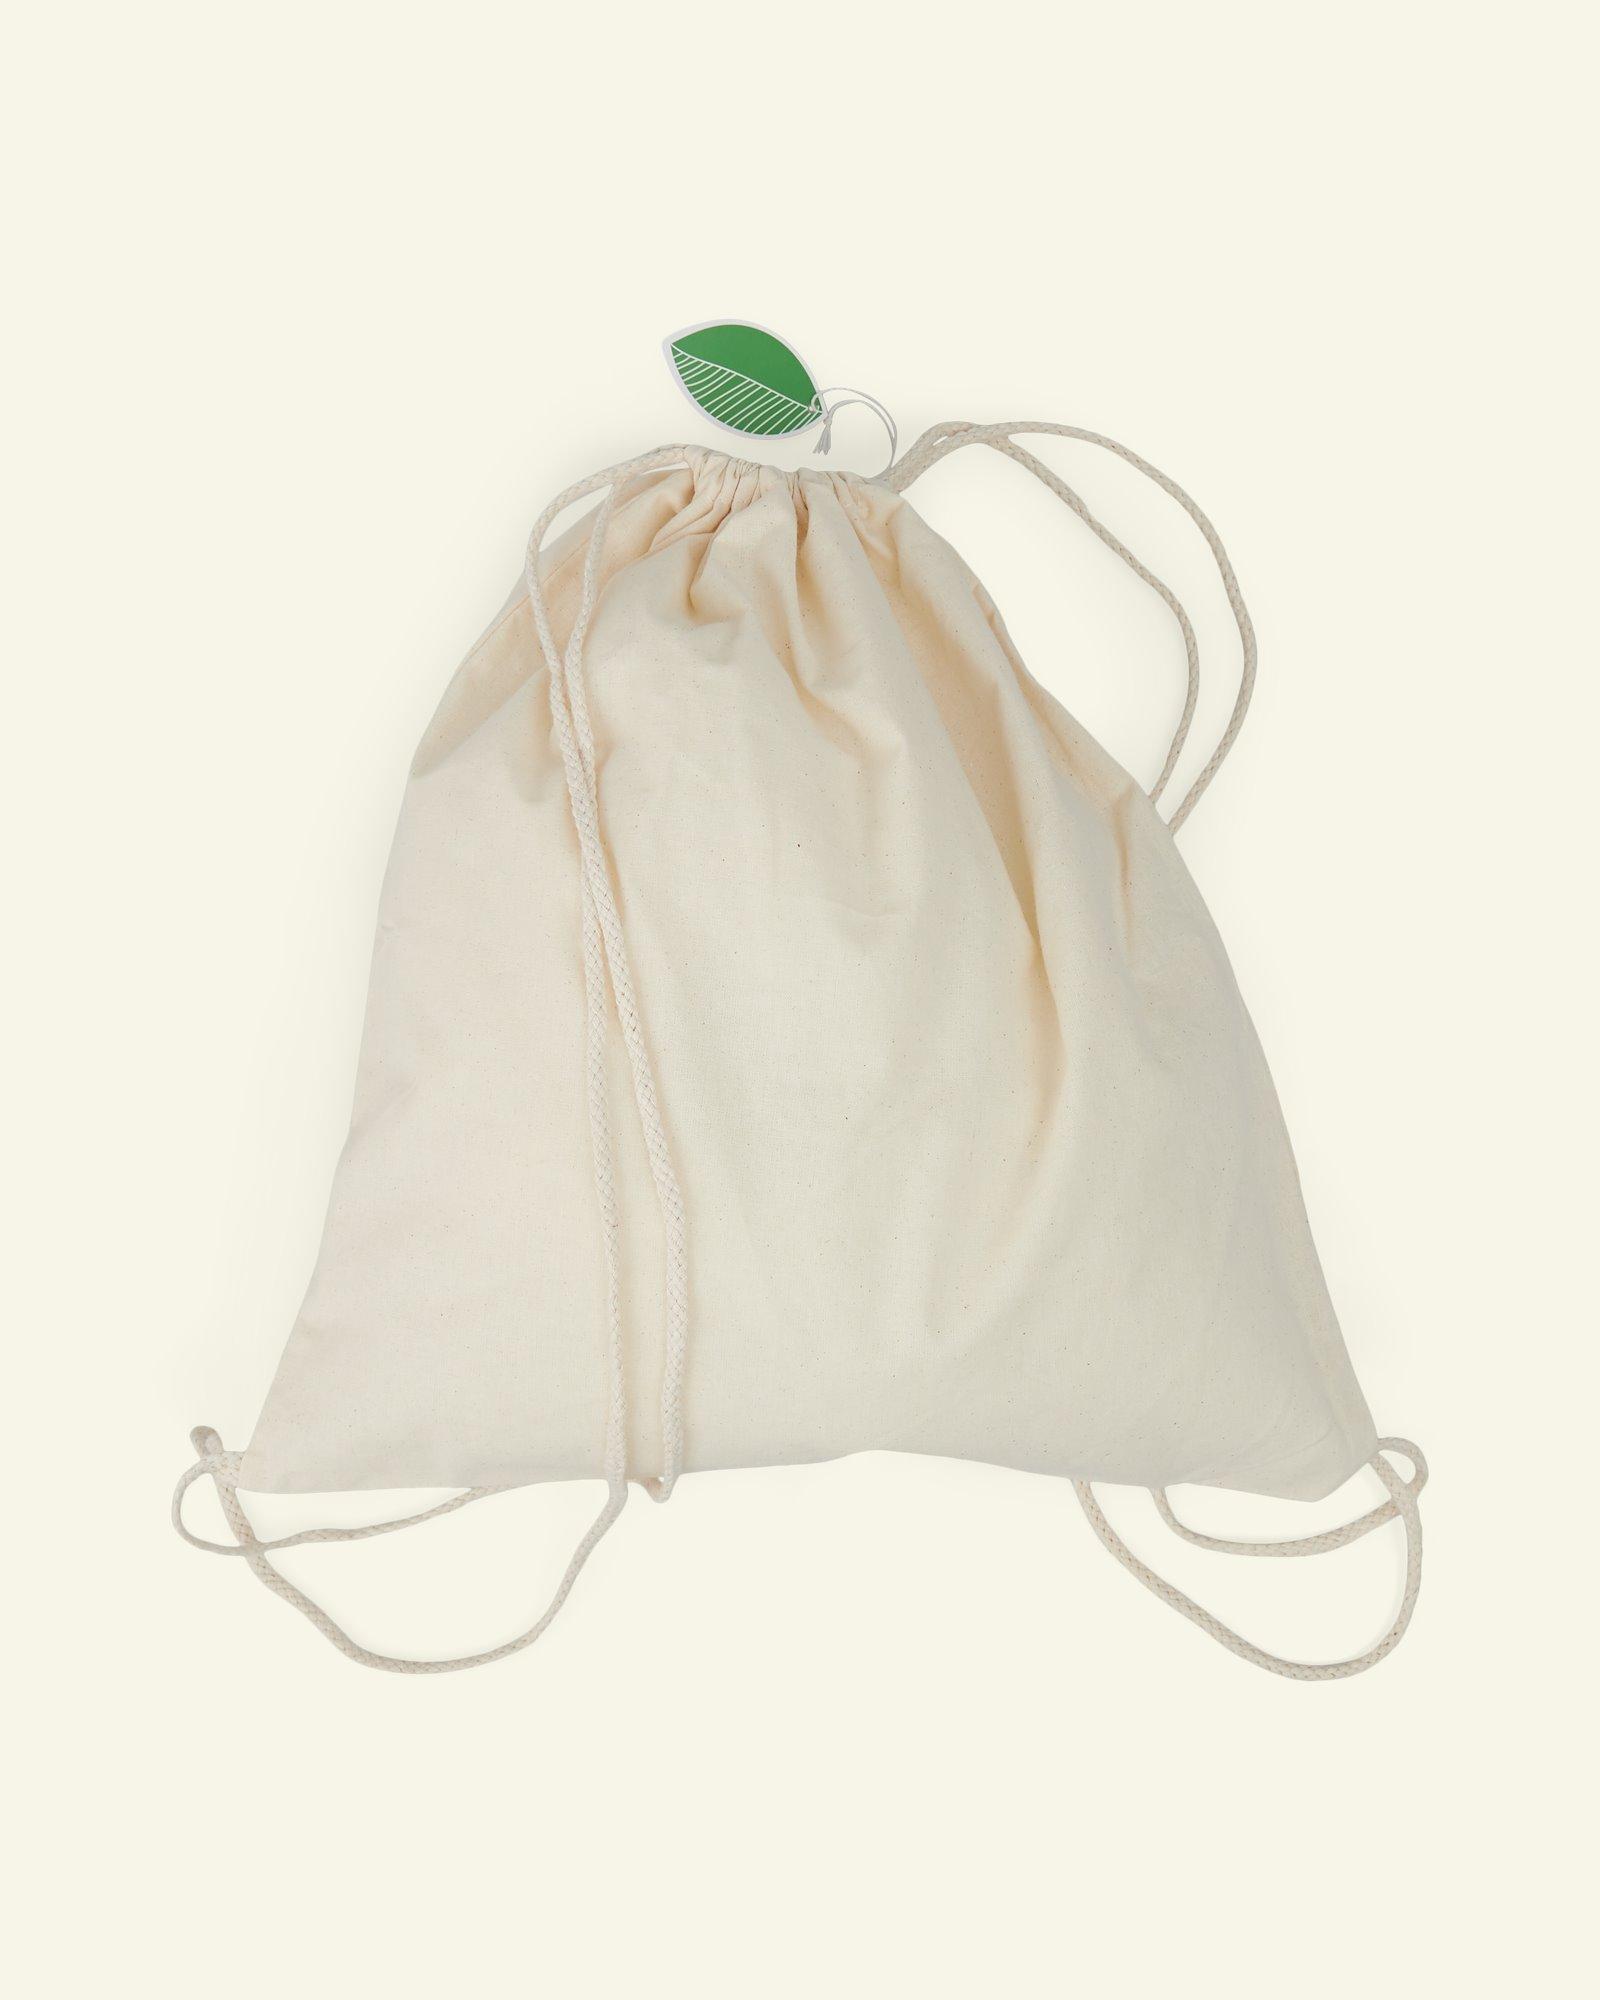 Organic cotton gym bag, 37*41 cm